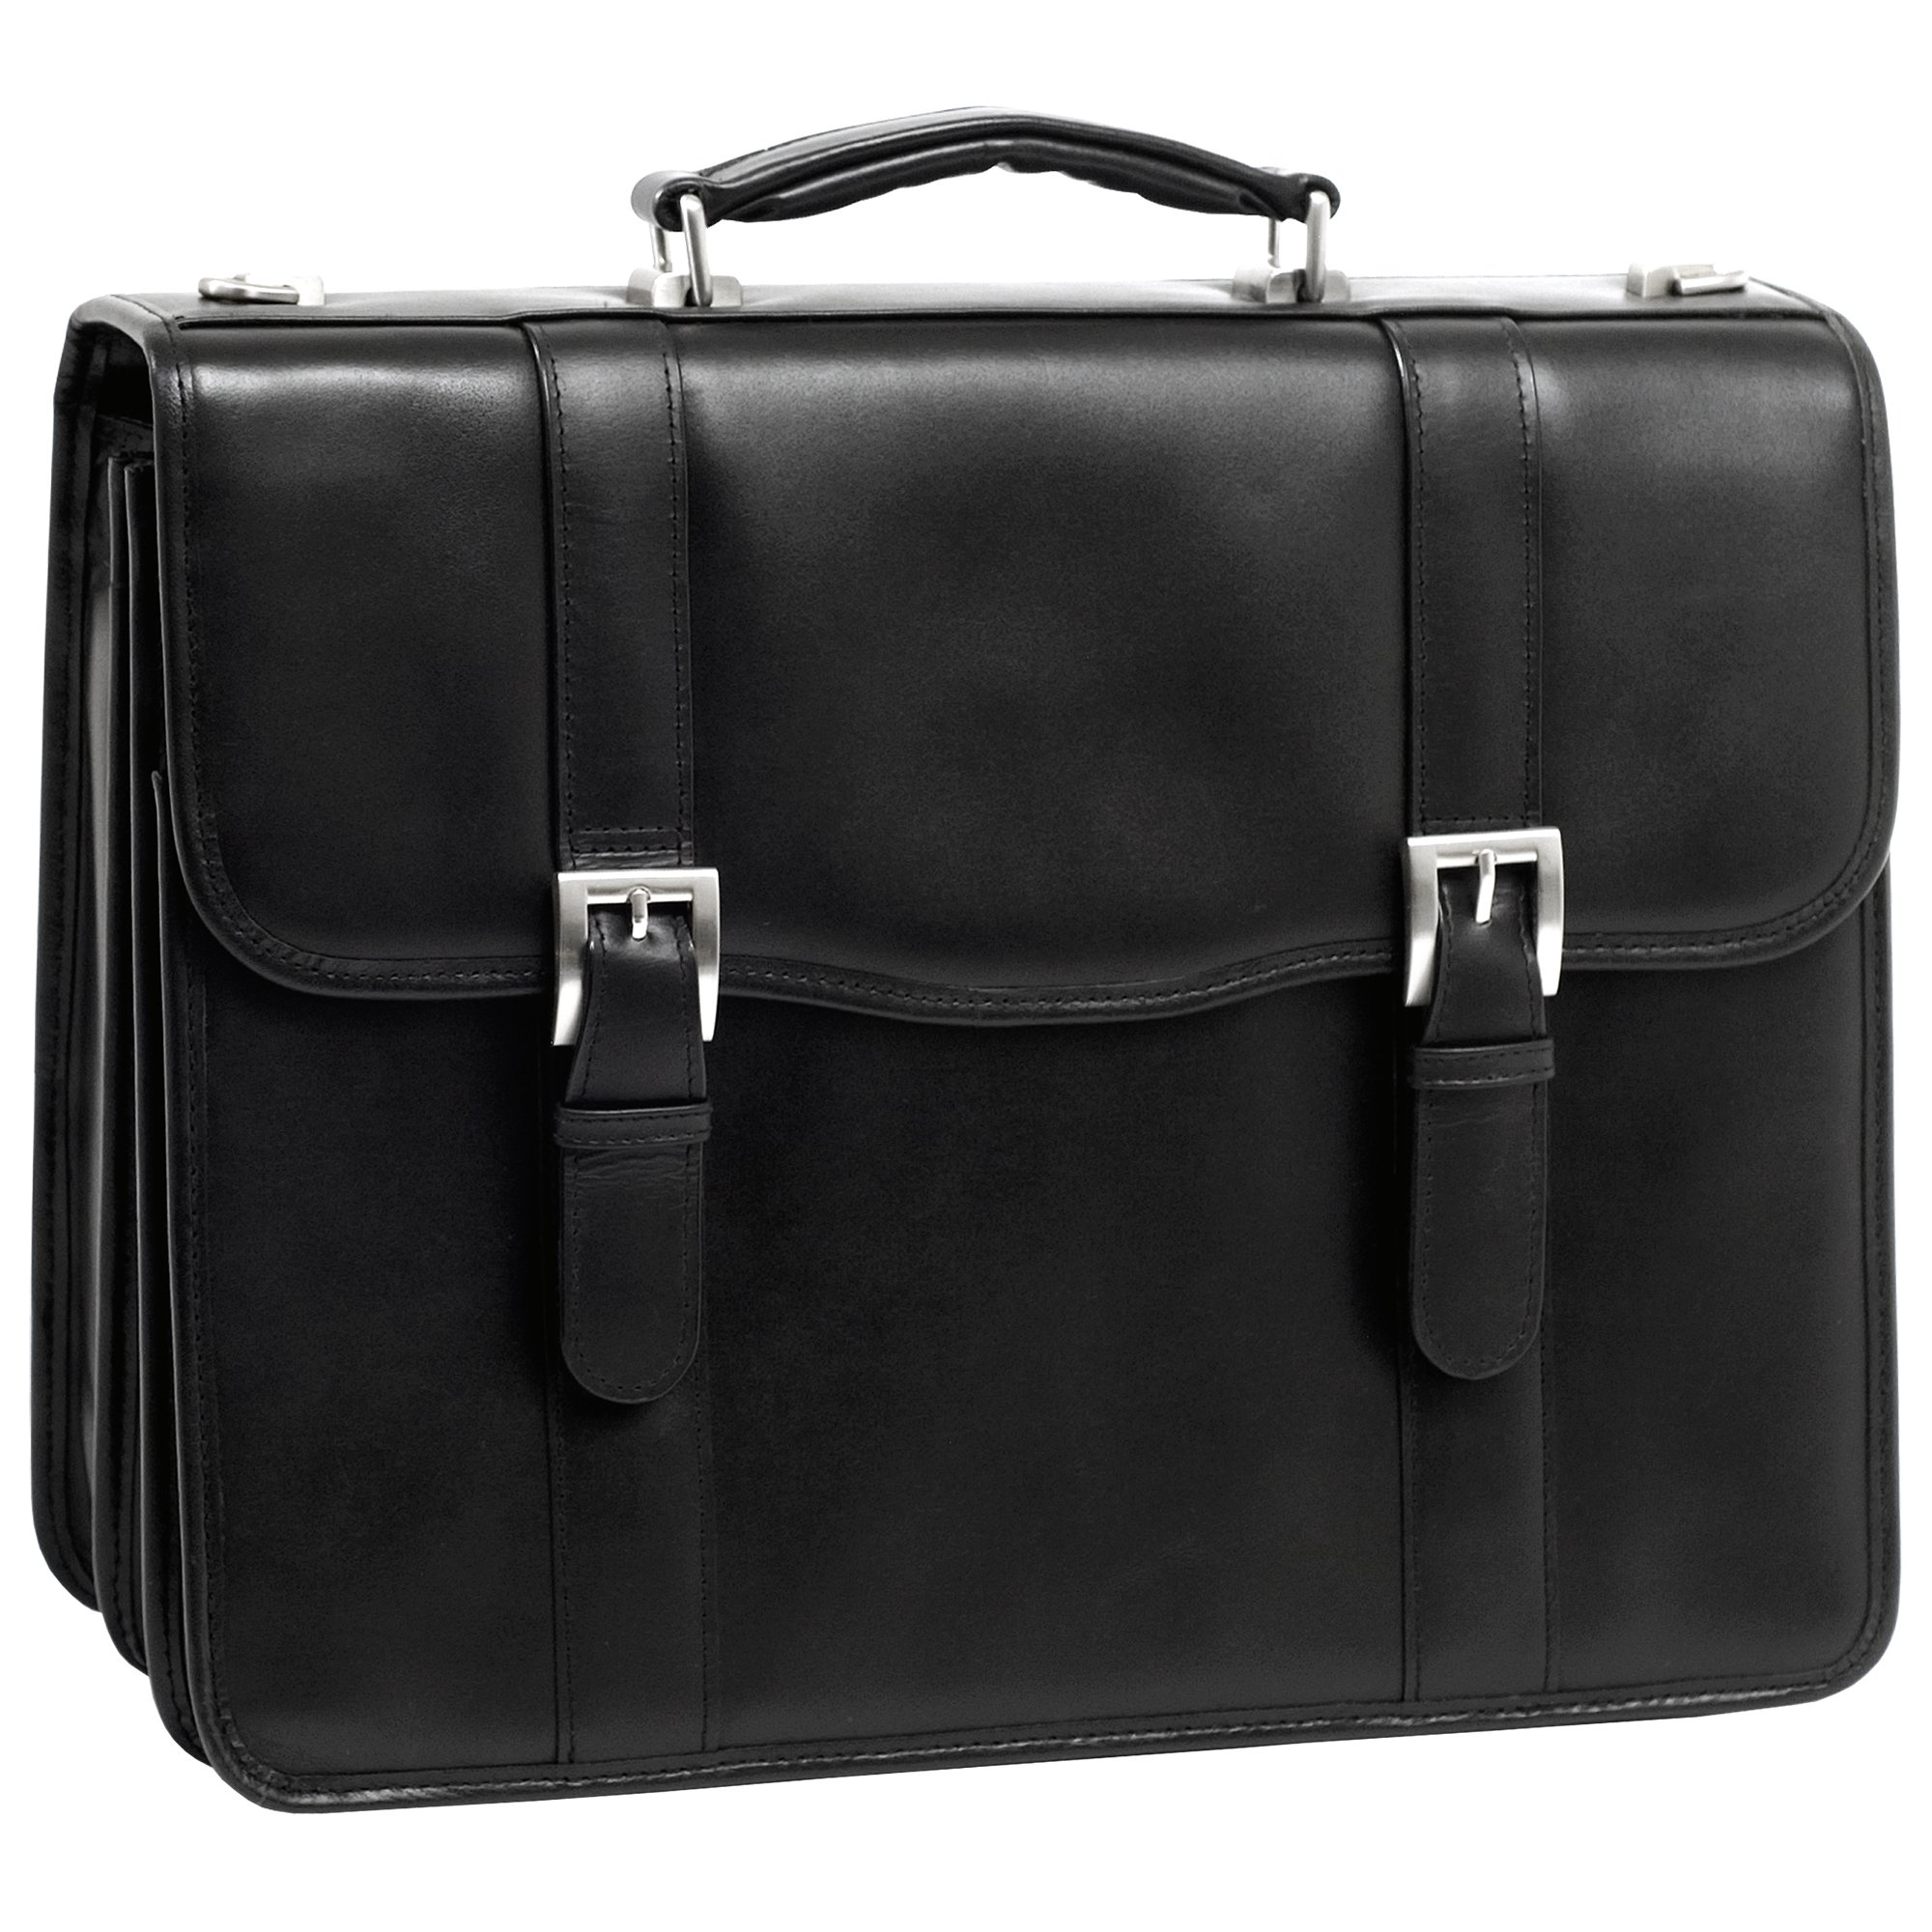 McKlein, V Series, FLOURNOY, Top Grain Cowhide Leather, 15'' Leather Double Compartment Laptop Briefcase, Black (85955) by McKleinUSA (Image #1)